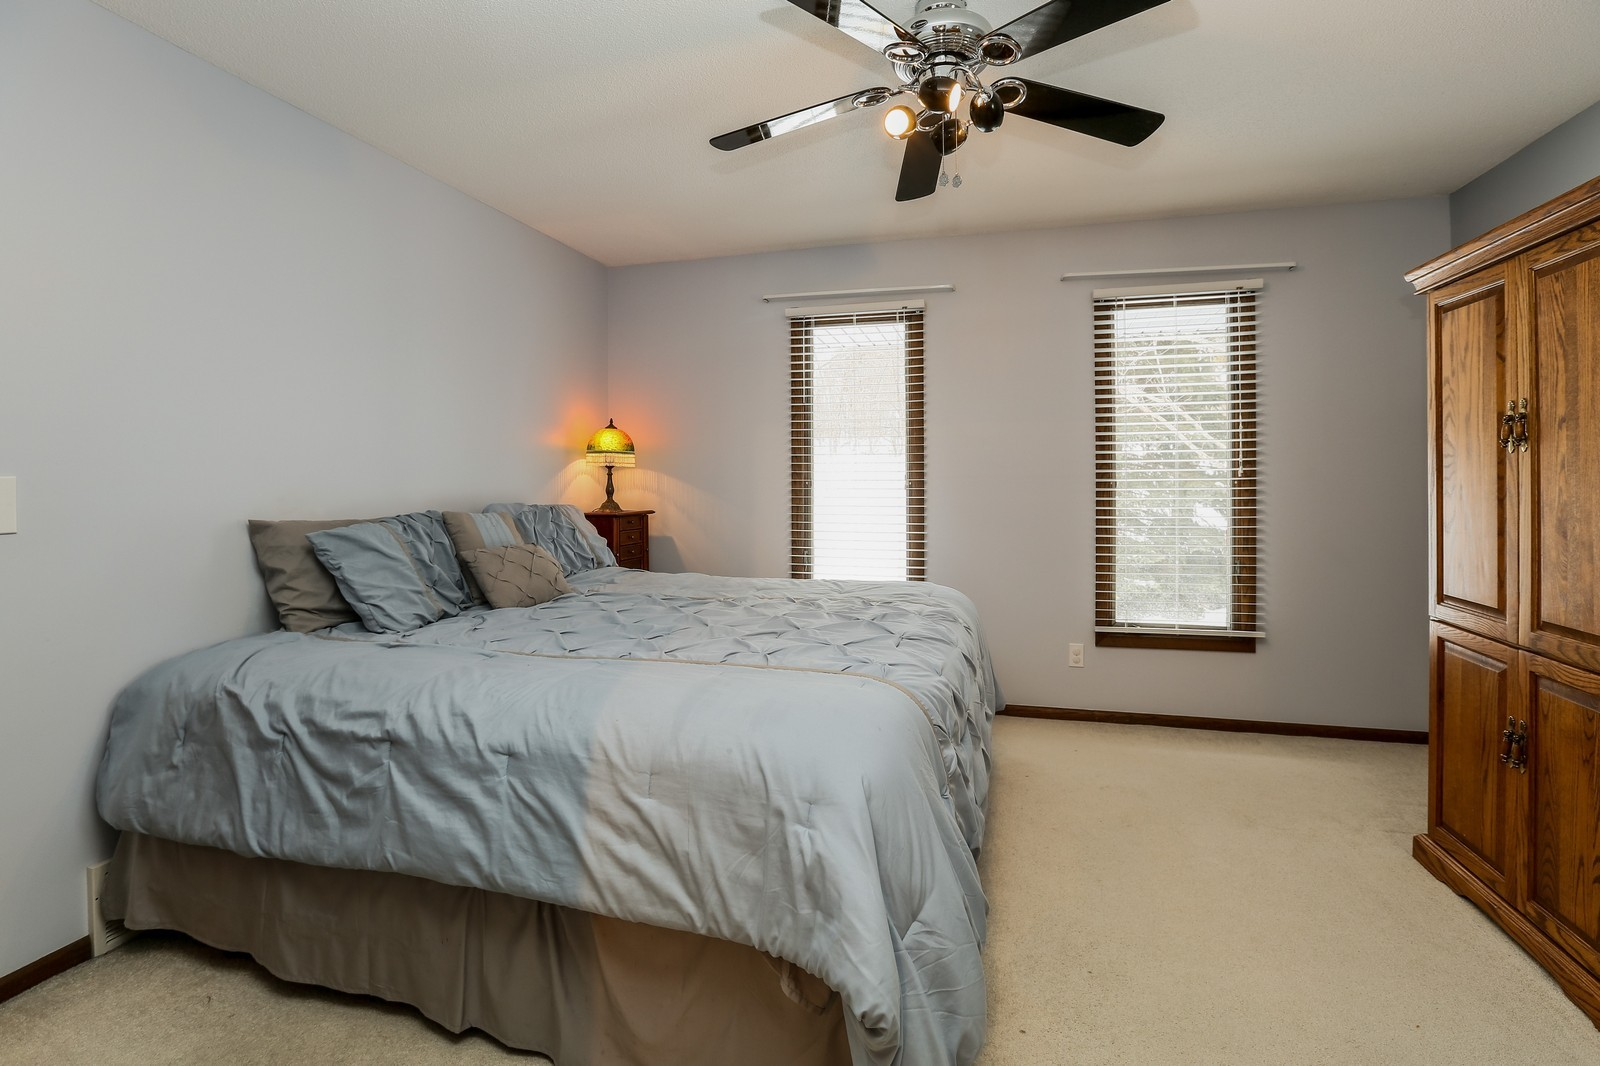 Real Estate Photography - 3250 Williams Lane, Minnetrista, MN, 55364 - Master Bedroom